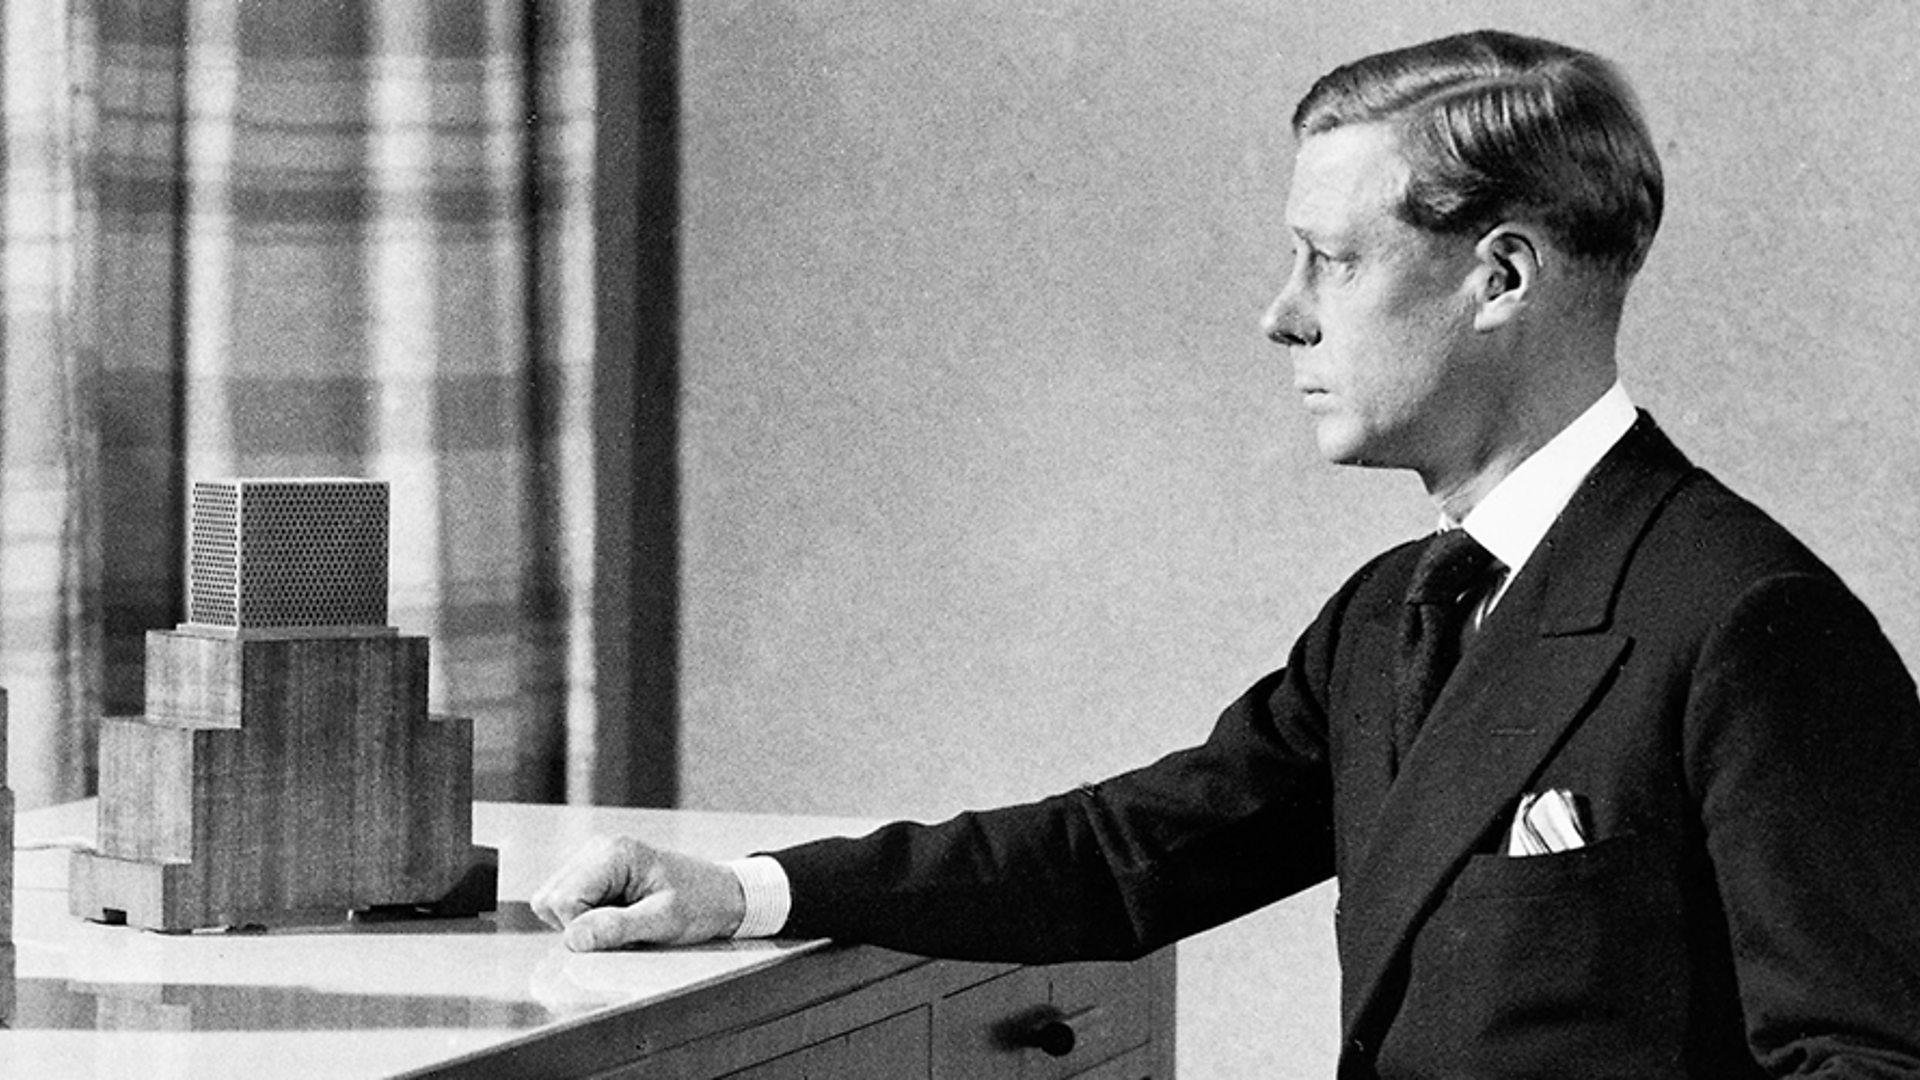 Edward VIII Abdication speech - History of the BBC